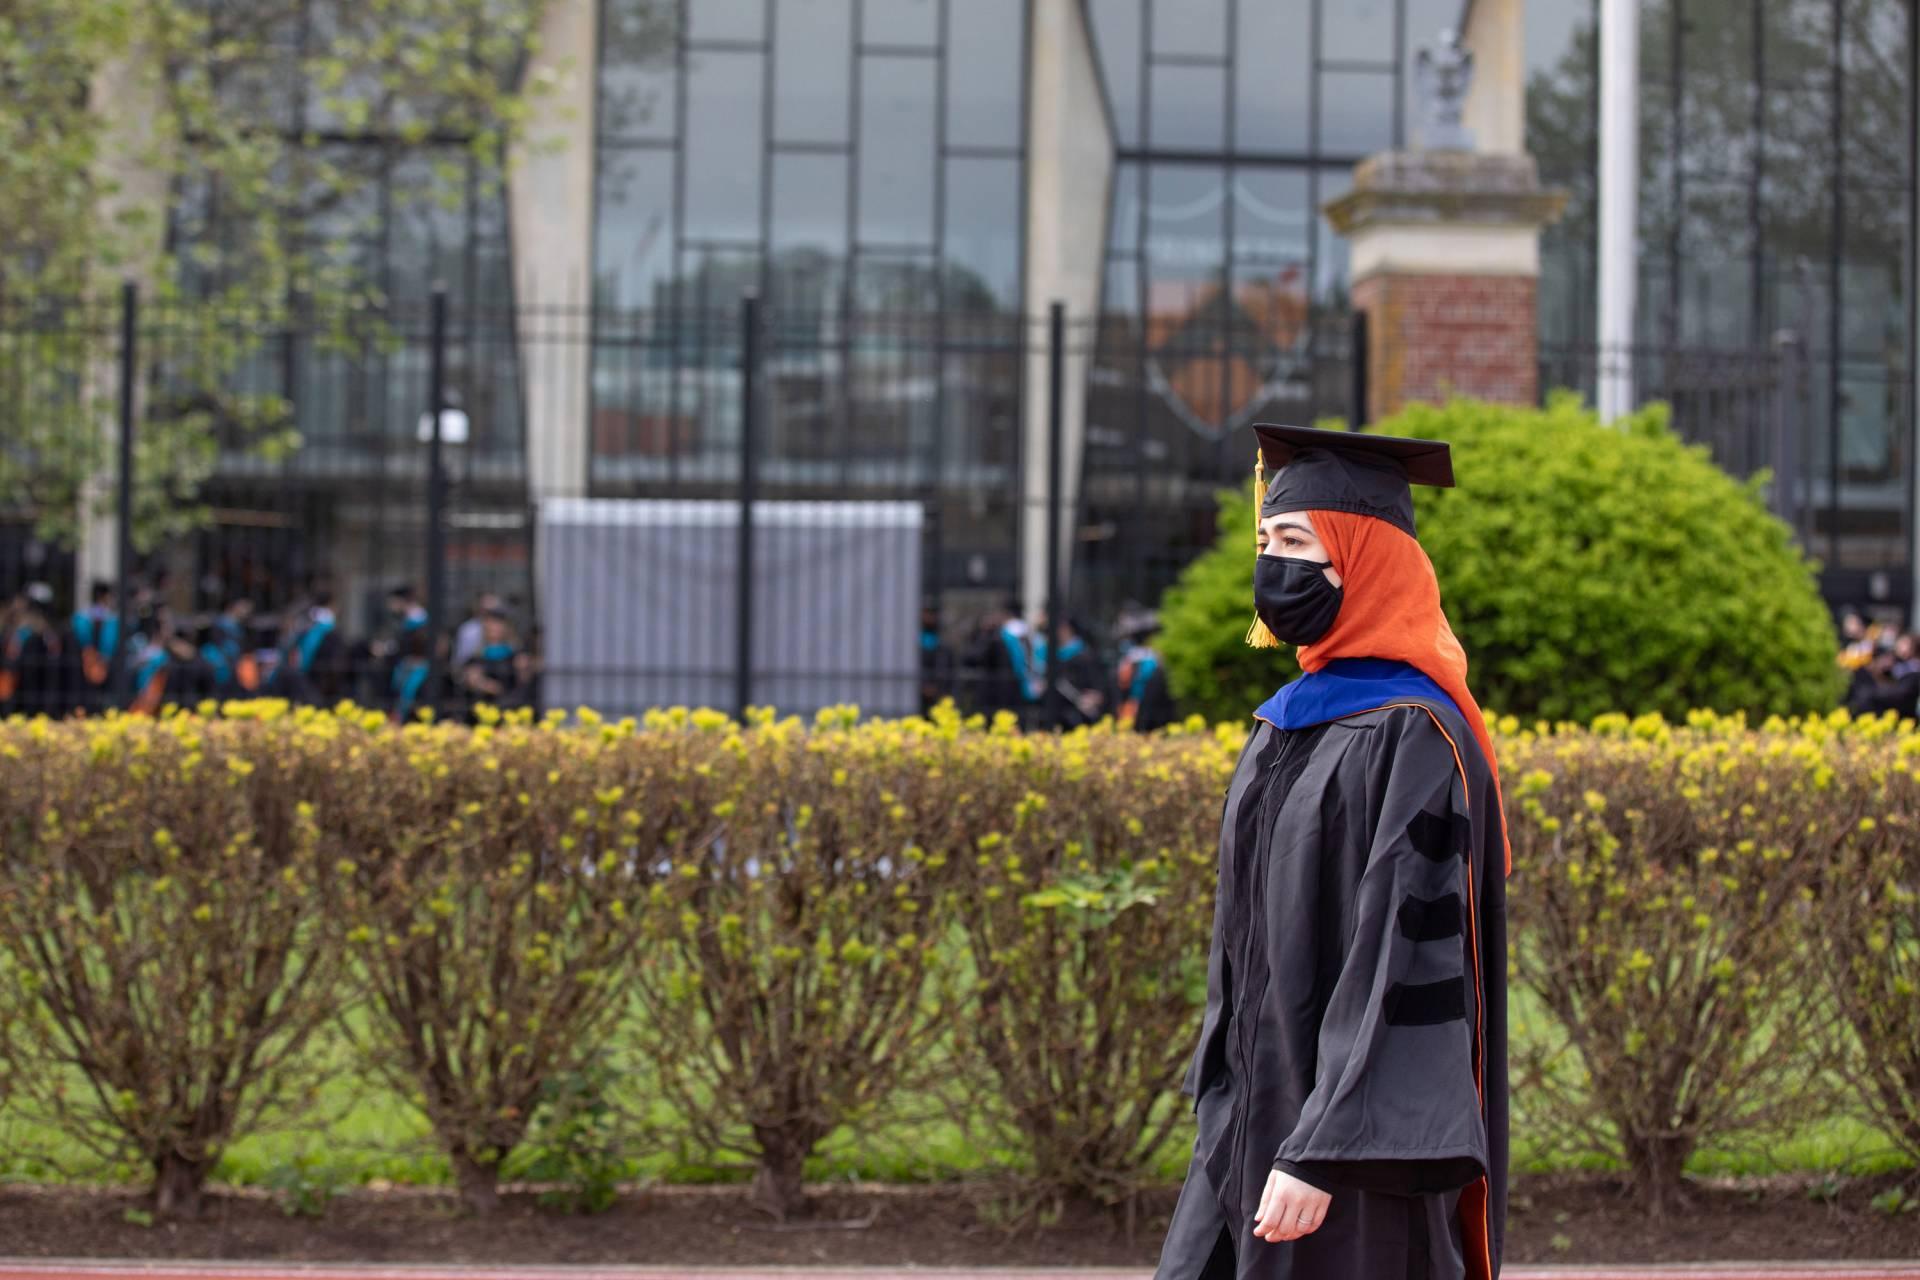 A graduate student walks to the stadium